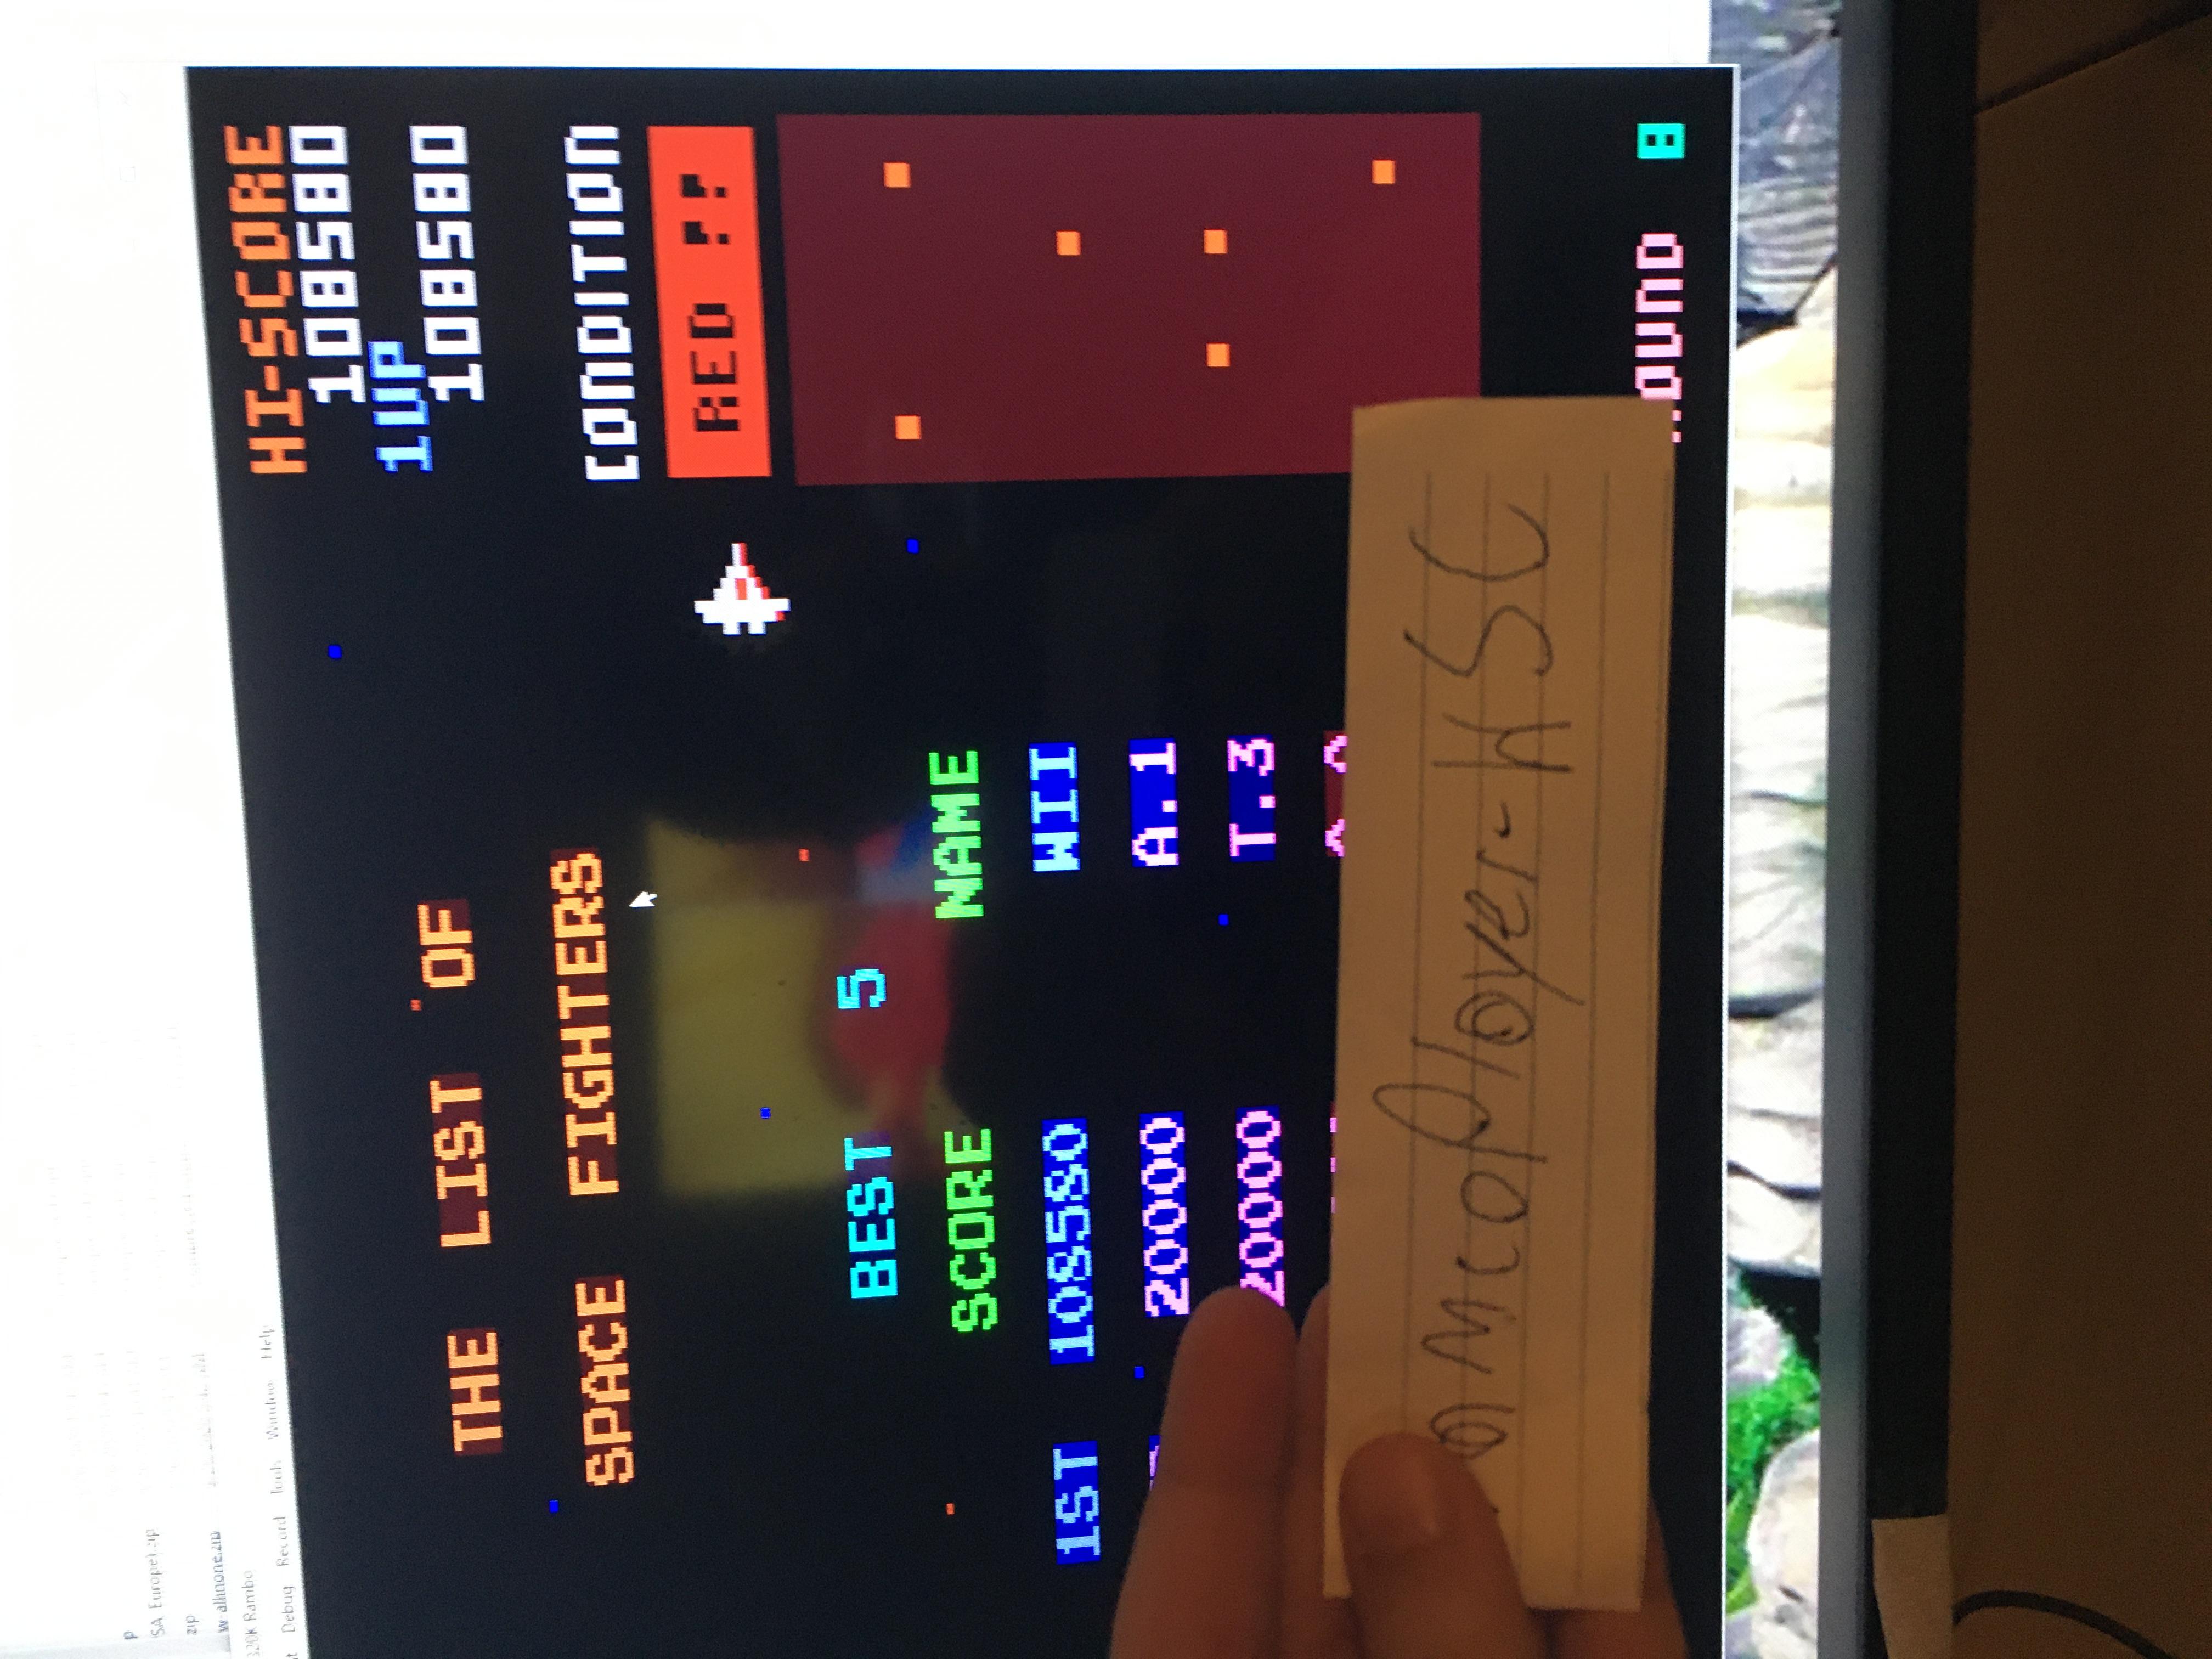 NamcoPlayer: Bosconian (Atari 400/800/XL/XE Emulated) 108,580 points on 2020-10-03 20:46:34